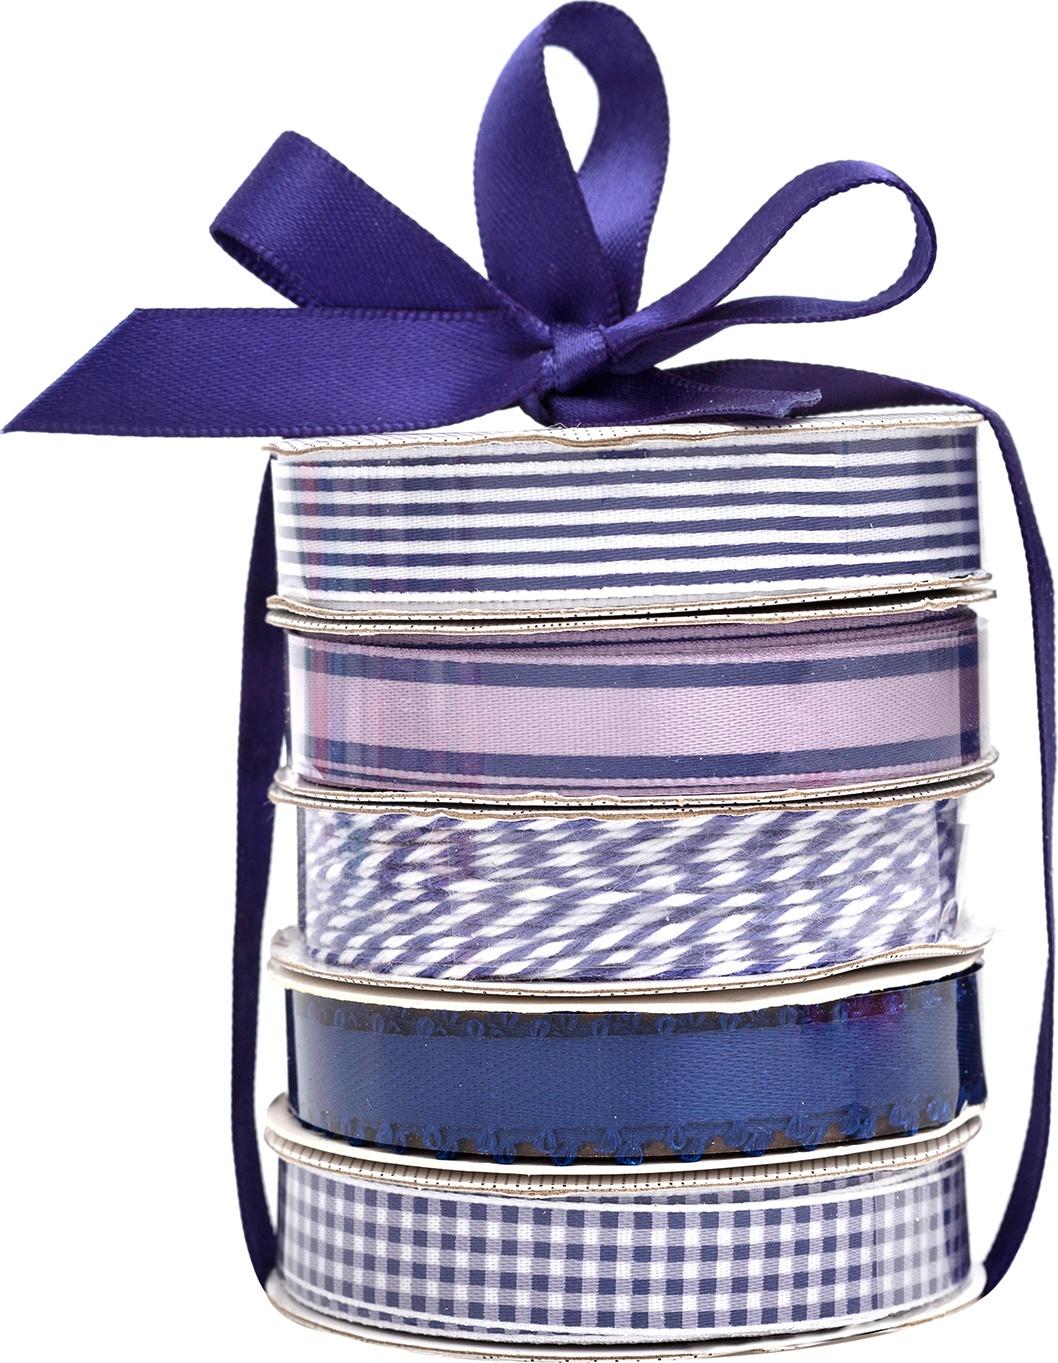 American Crafts Premium Ribbon & Twine 5/Pkg-Navy